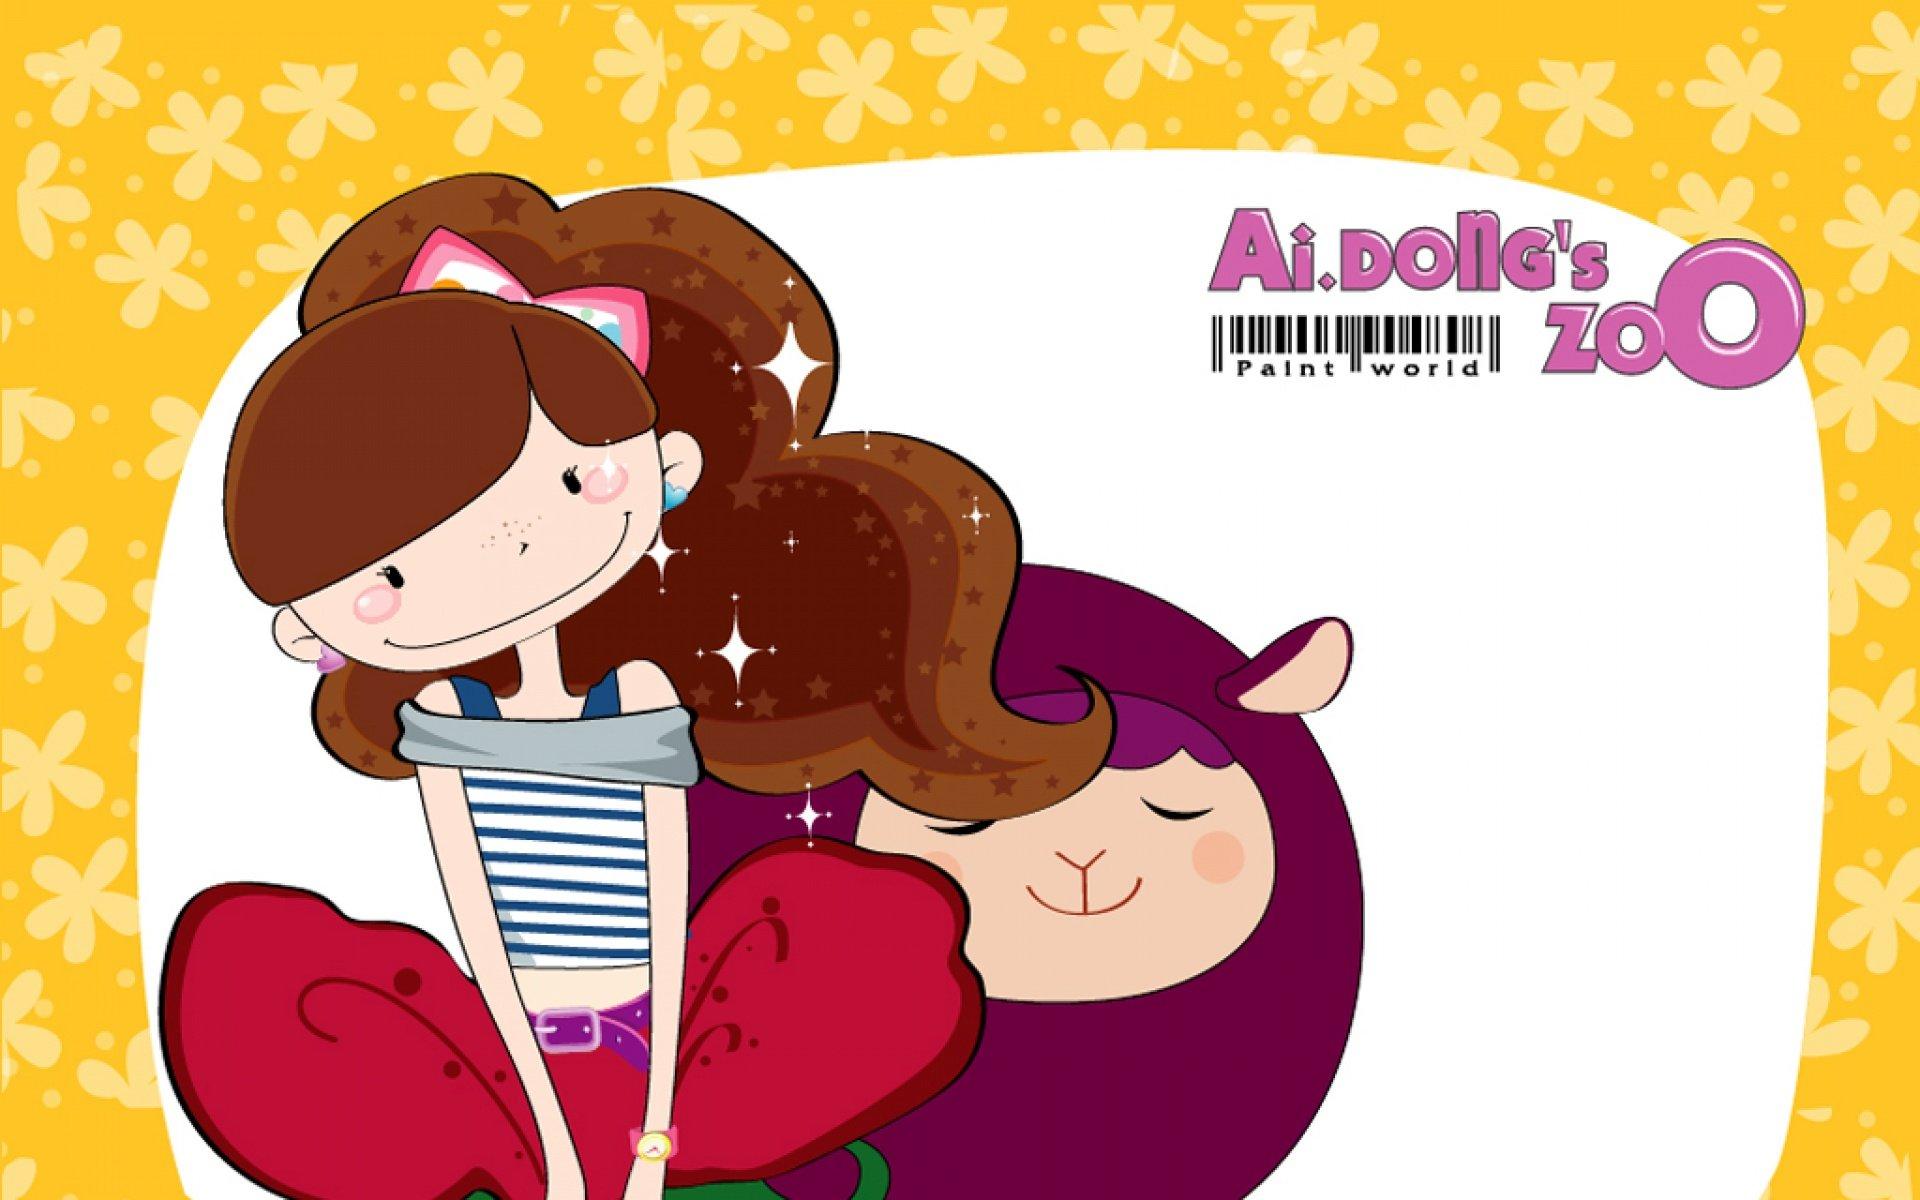 android安卓爱冬 女孩 精美 可爱 原创 卡通高清手机